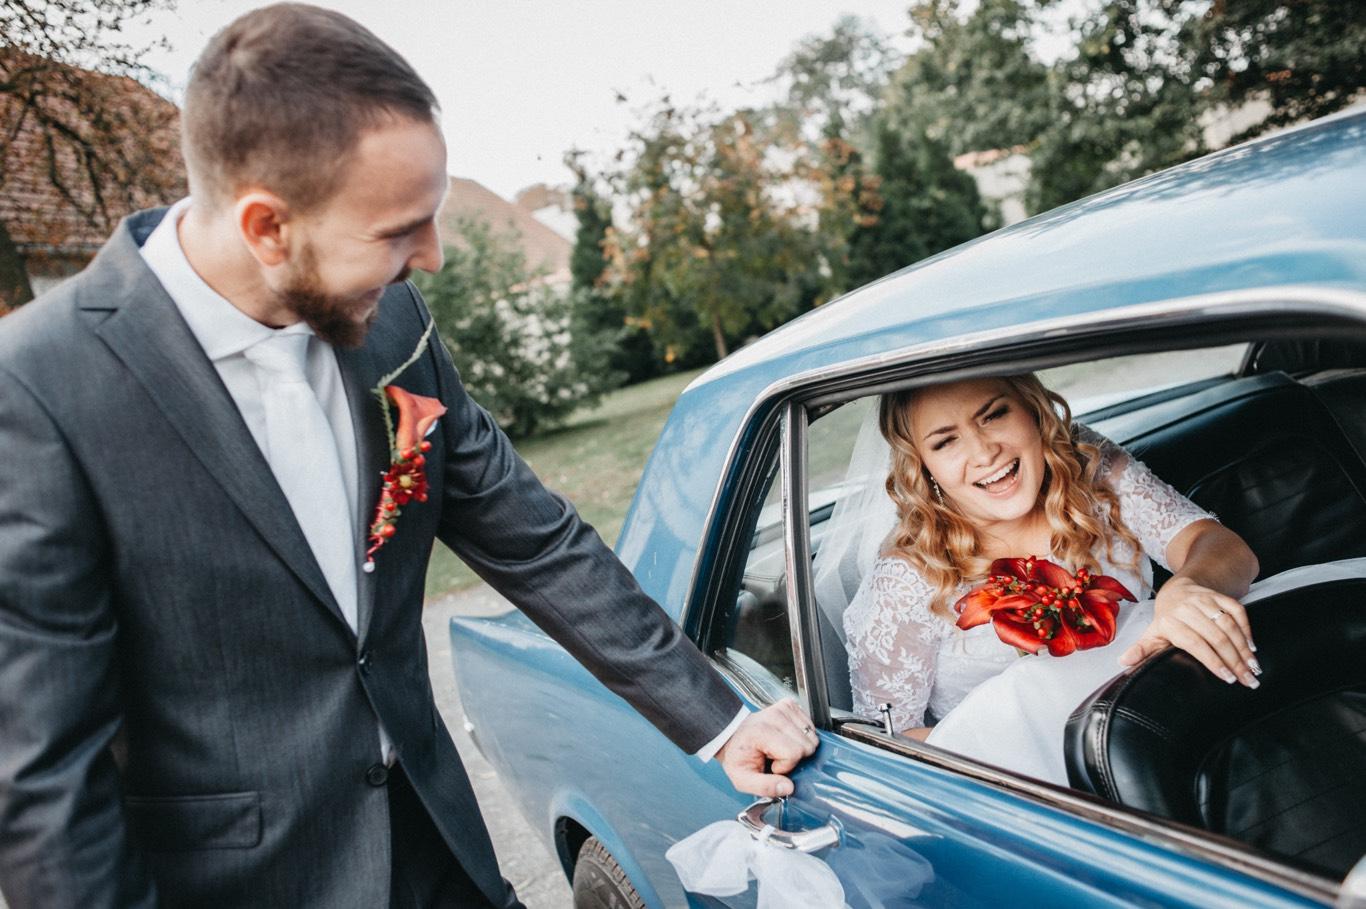 Momentka ze svatby